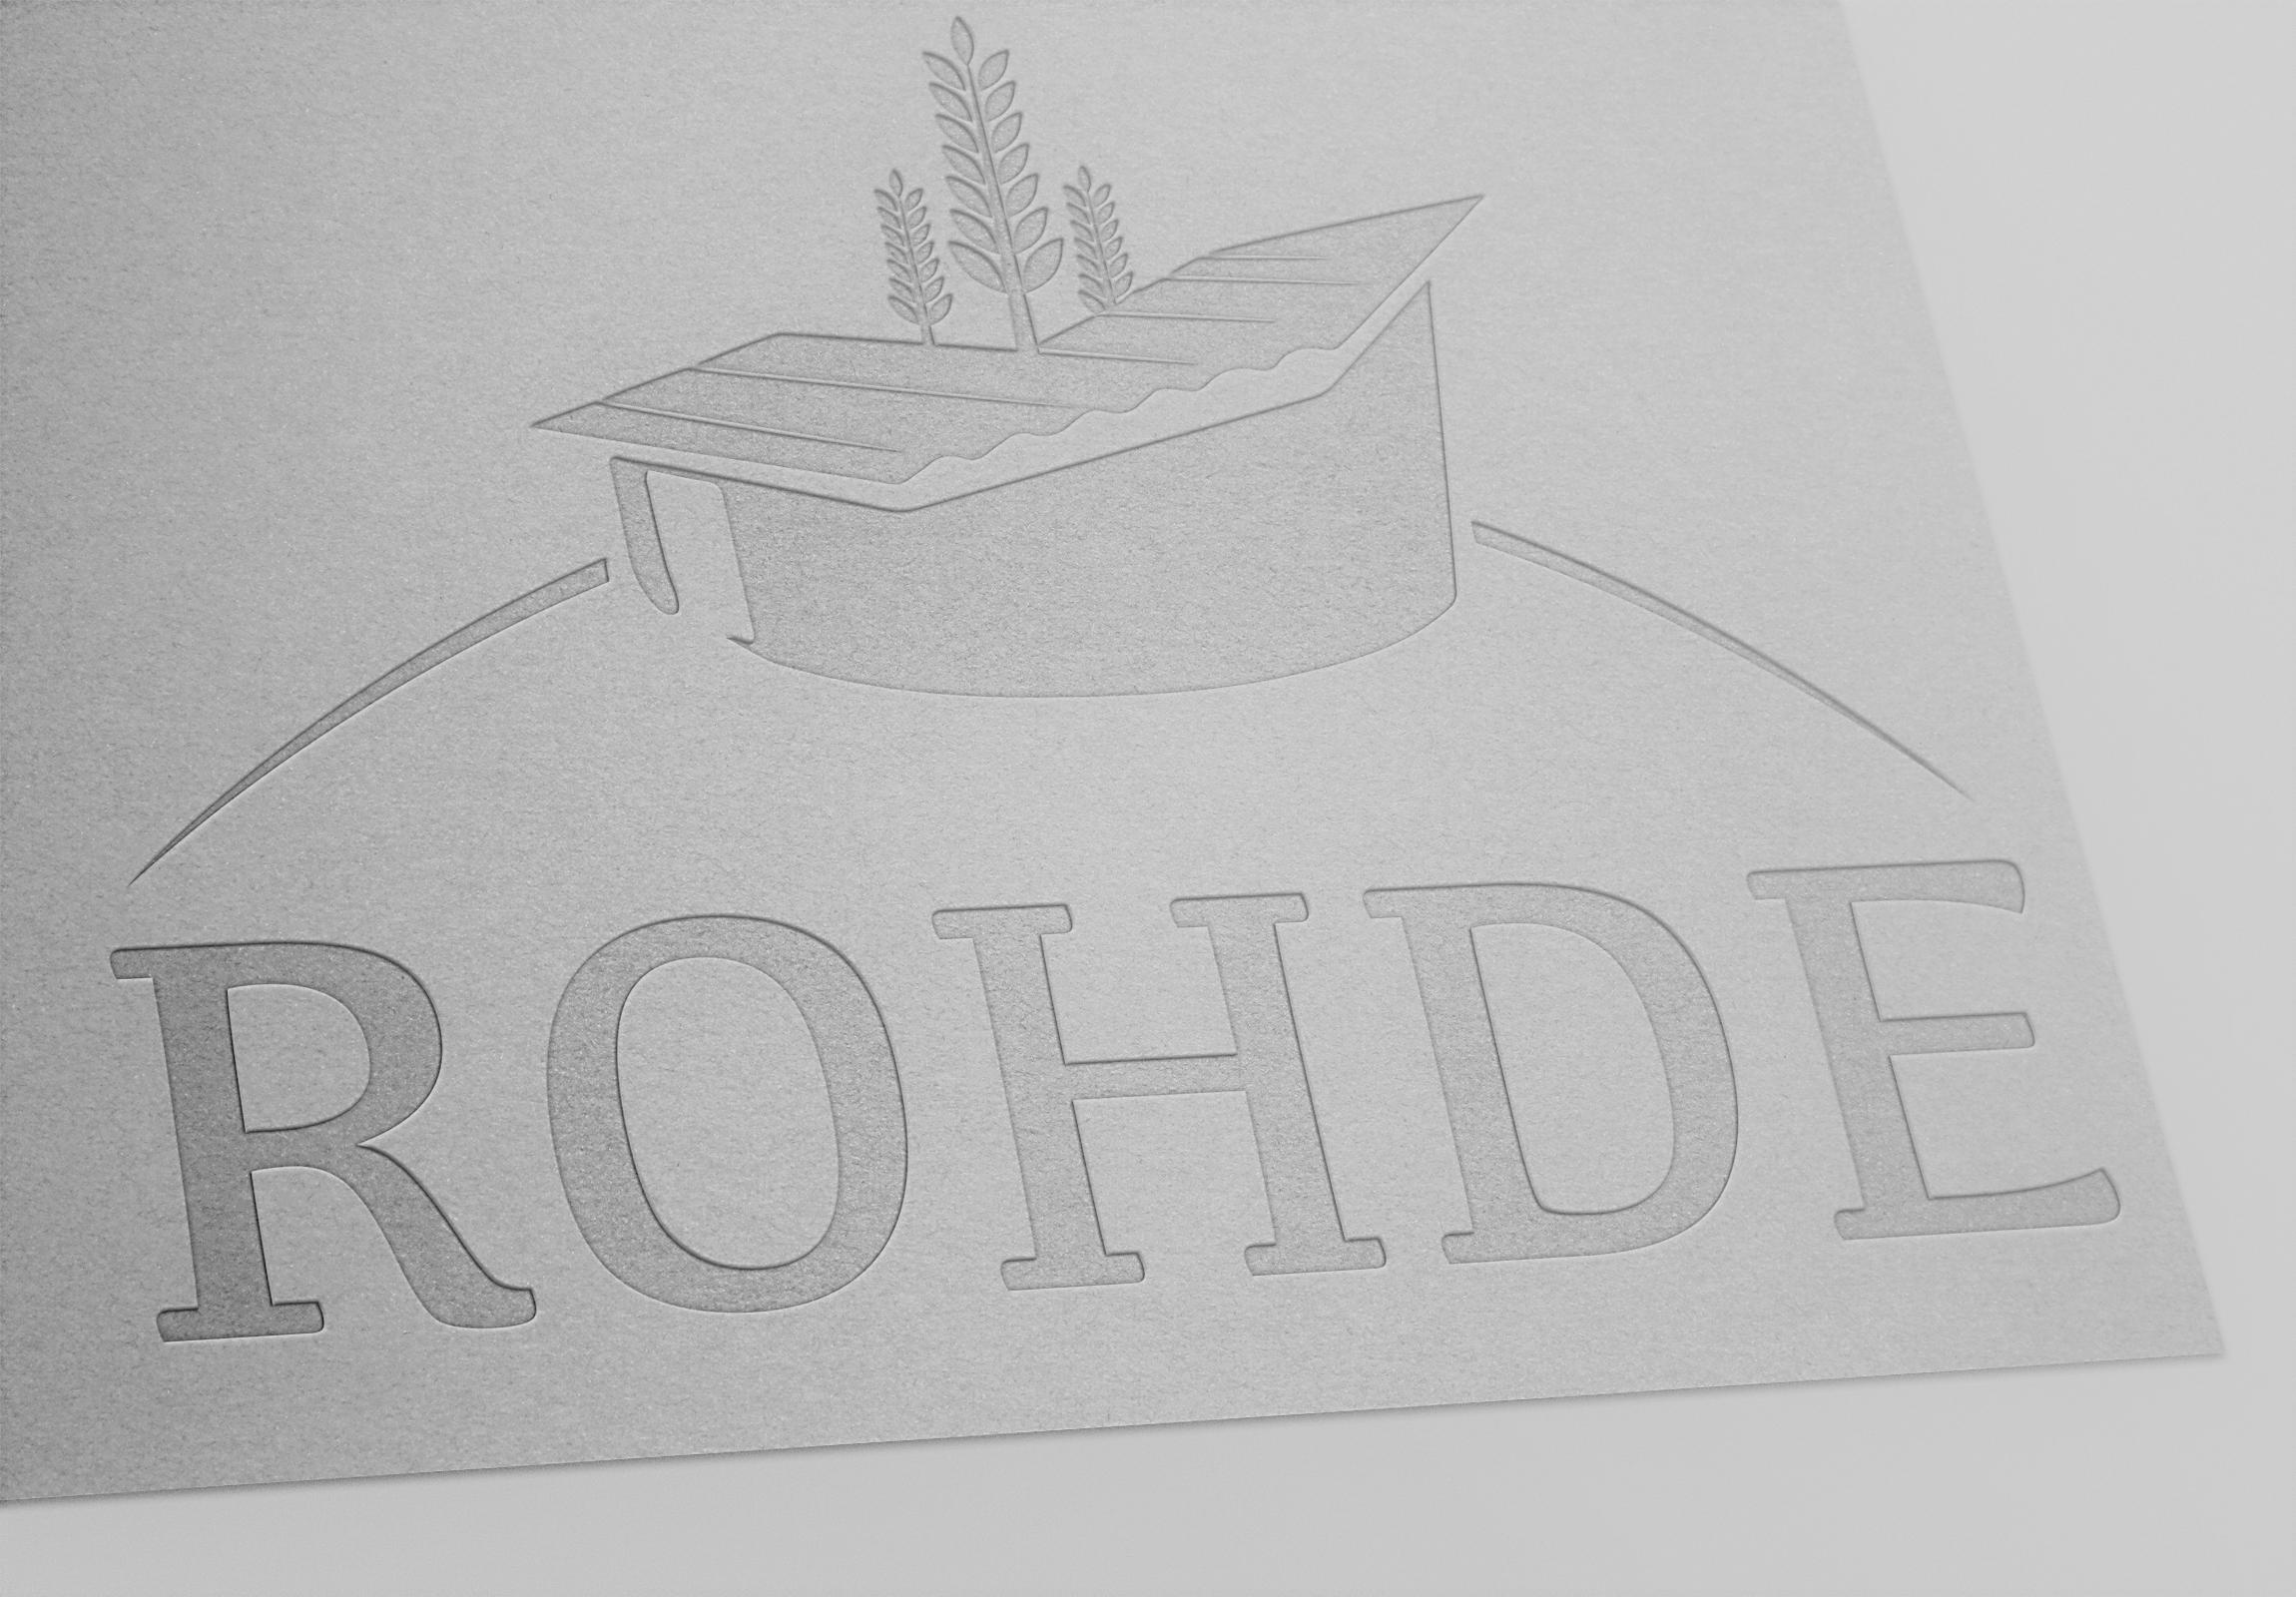 Mockup des Logos Hof Rohde